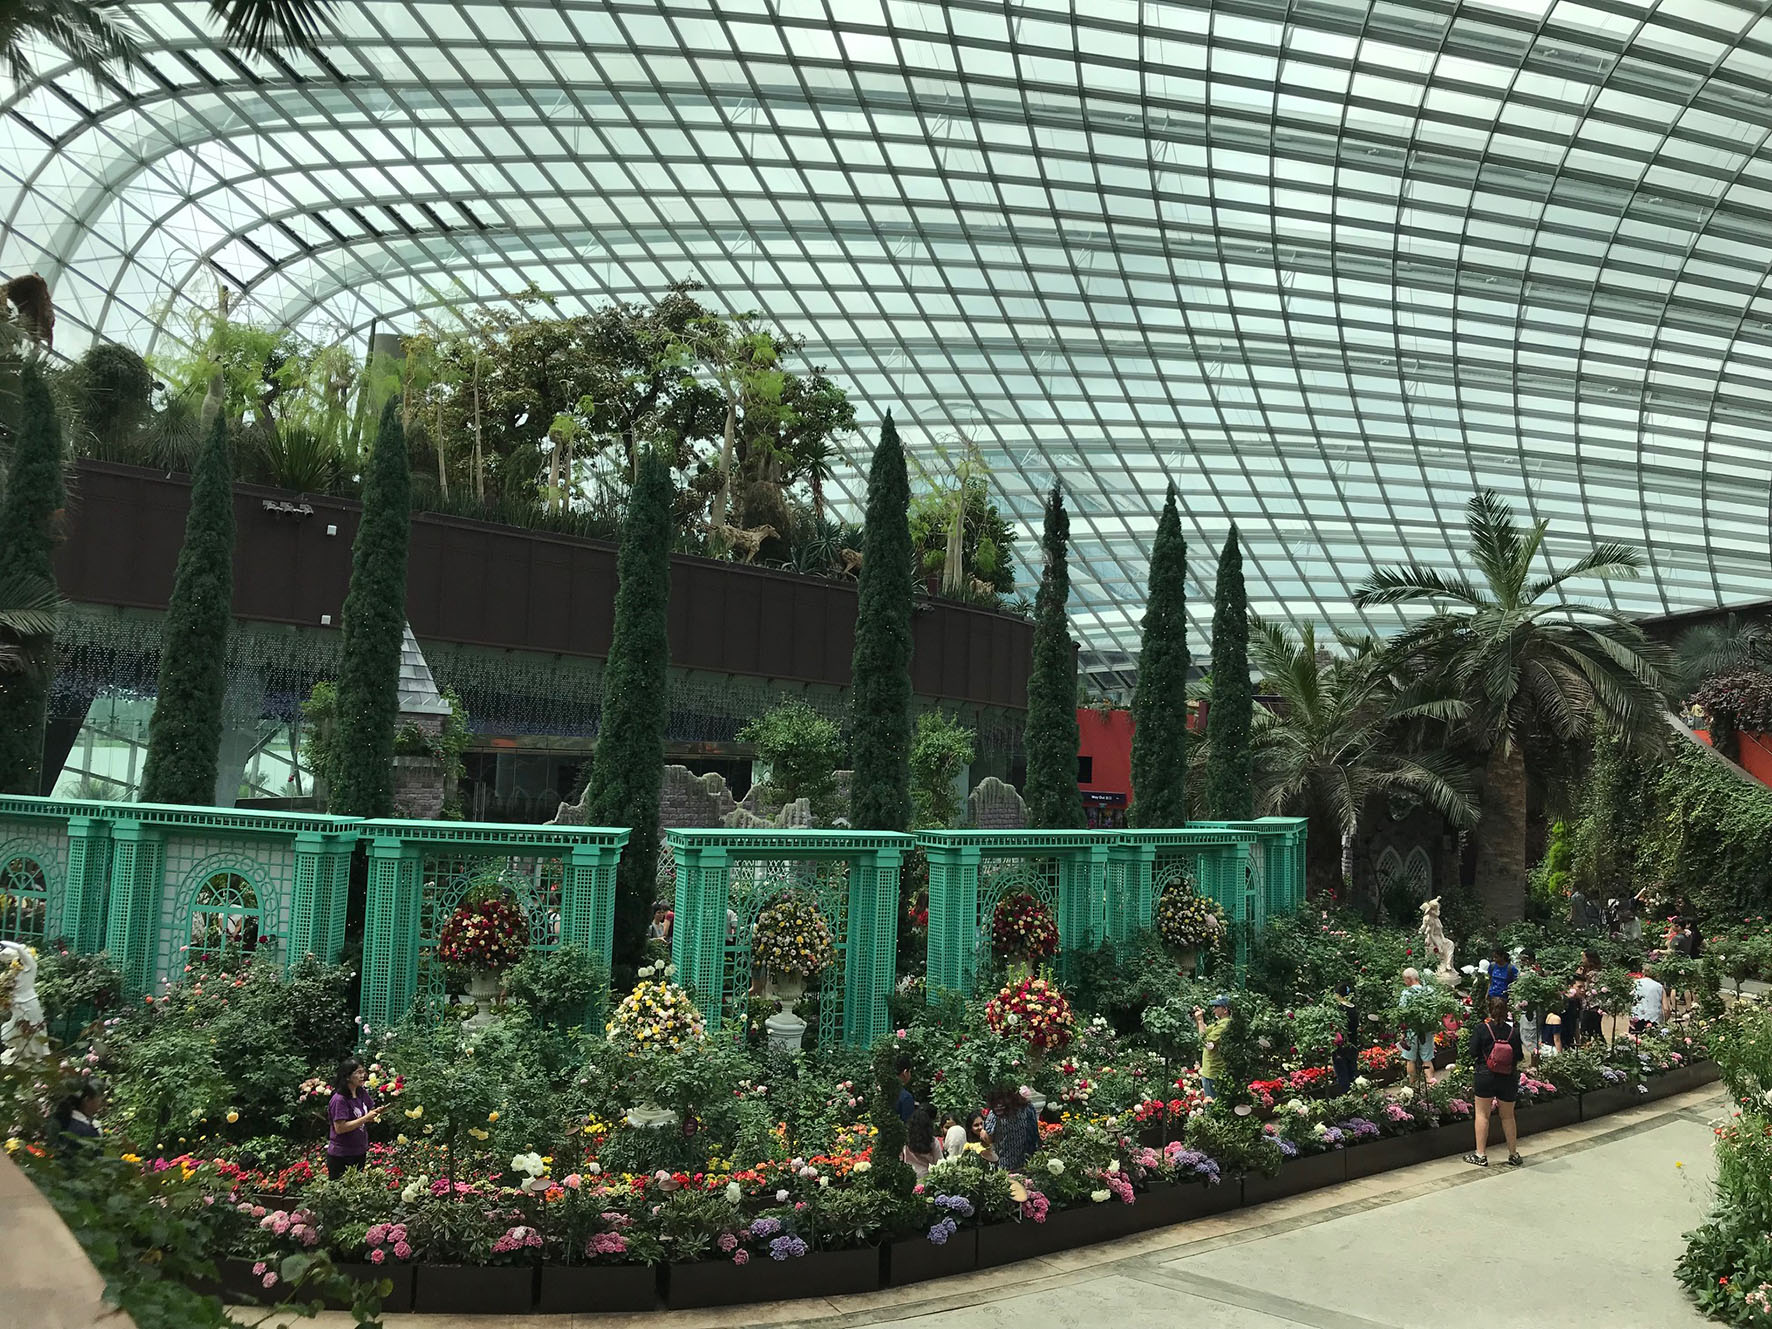 Roseraie Ducher Singapour dome.jpg